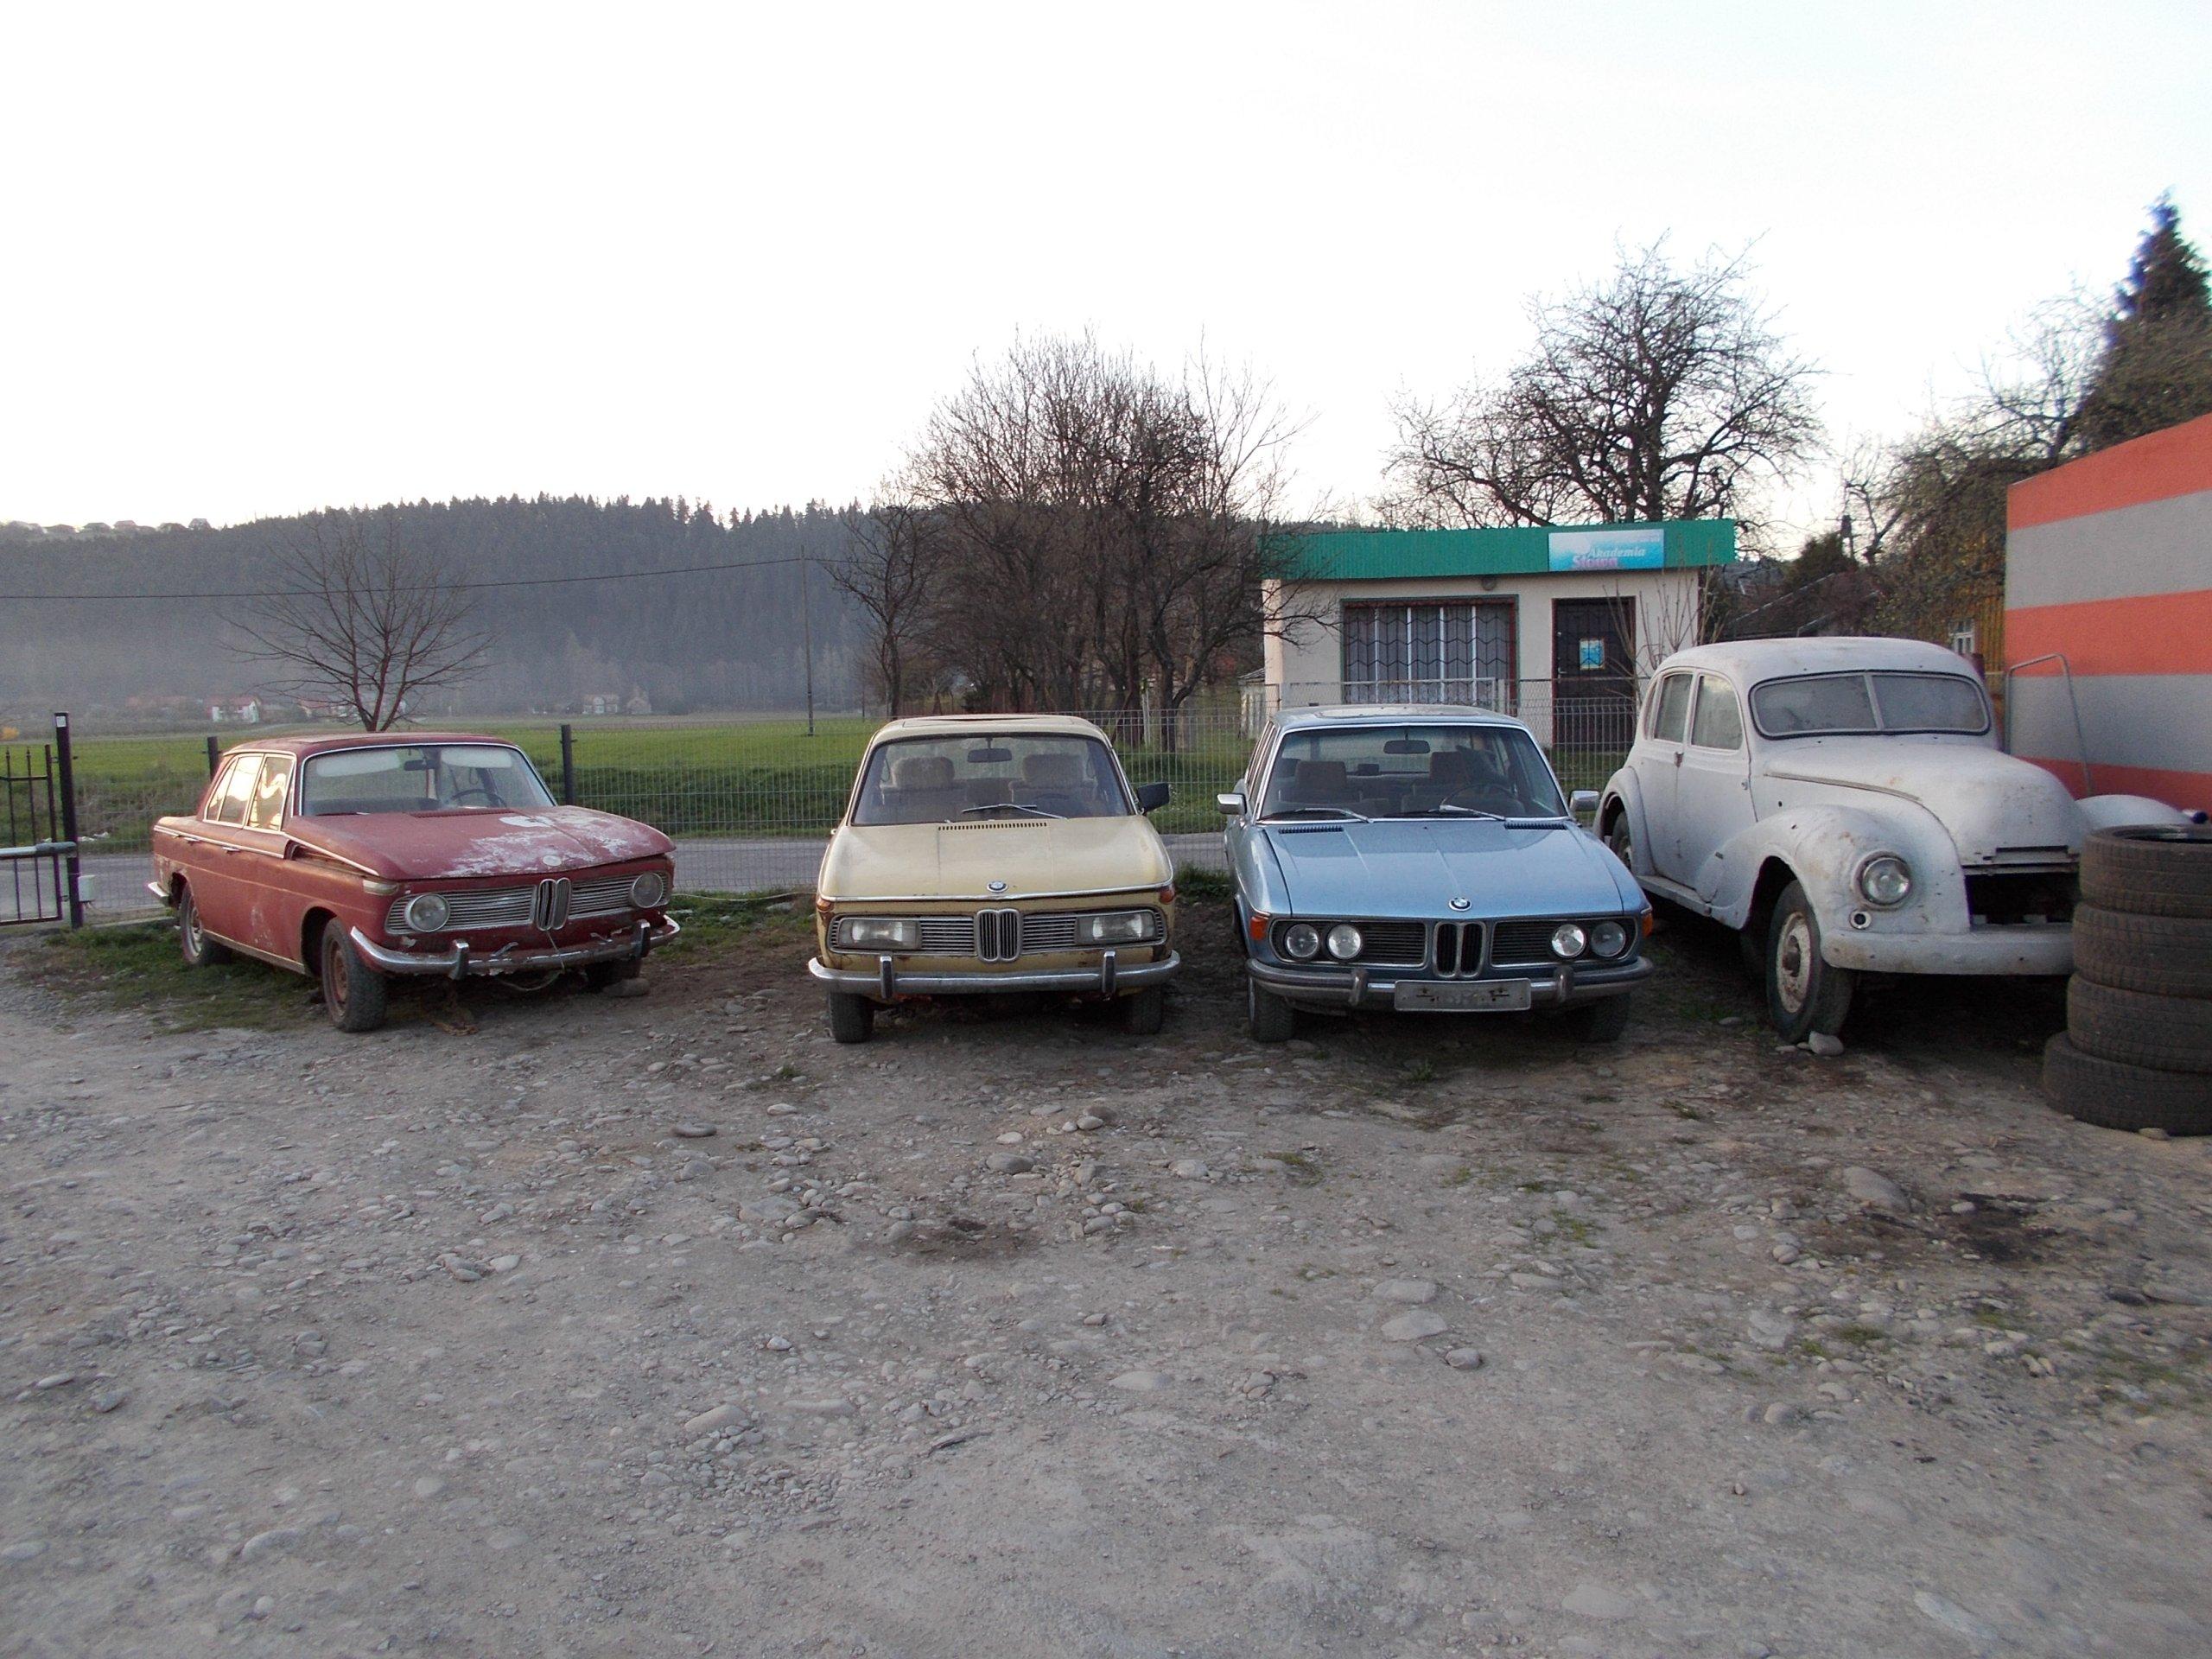 WIELKA PROMOCJA 4 BMW PAKIET SUPER CENA